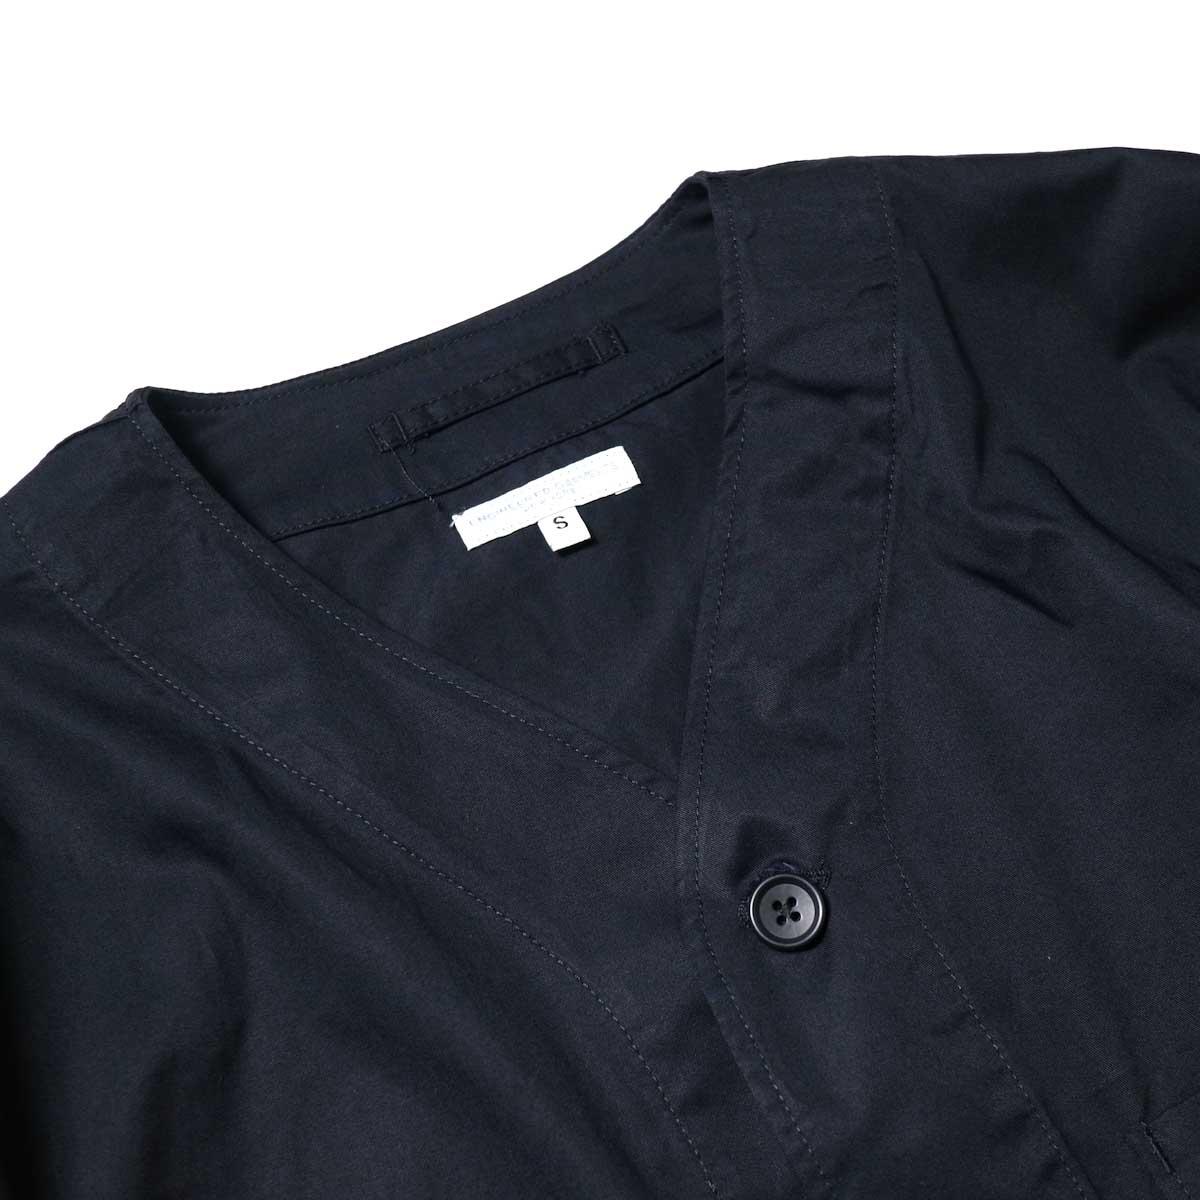 Engineered Garments / Cardigan Jacket -High Count Twill (Black)Vネック